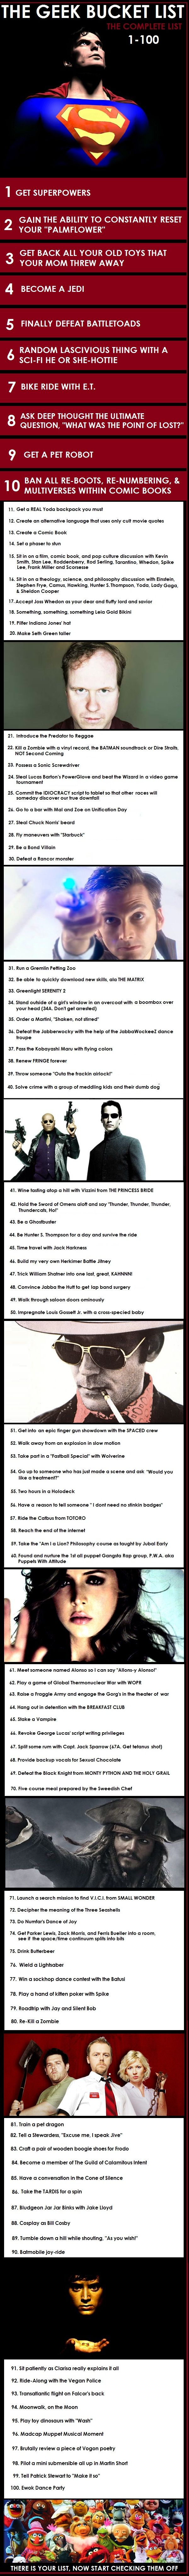 THE GEEK BUCKET LIST: 100 Geektastic Things to Do Before You Kick It.